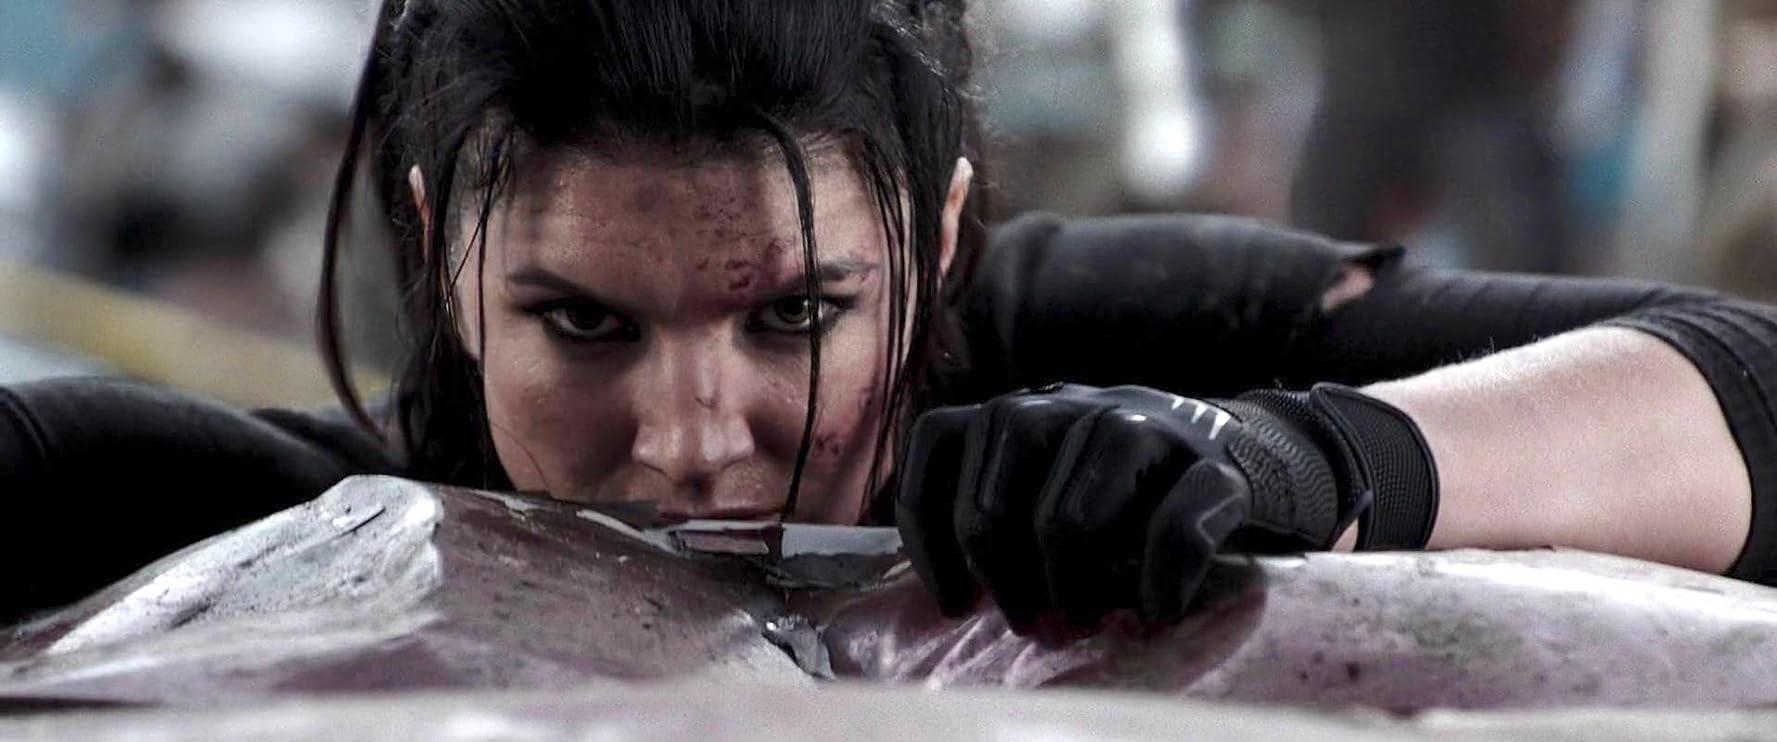 GamesEntertainmentIGN EntertainmentThe Mandalorian: Gina Carano Joins the Cast of Star Wars ShowStar Wars: The Mandalorian